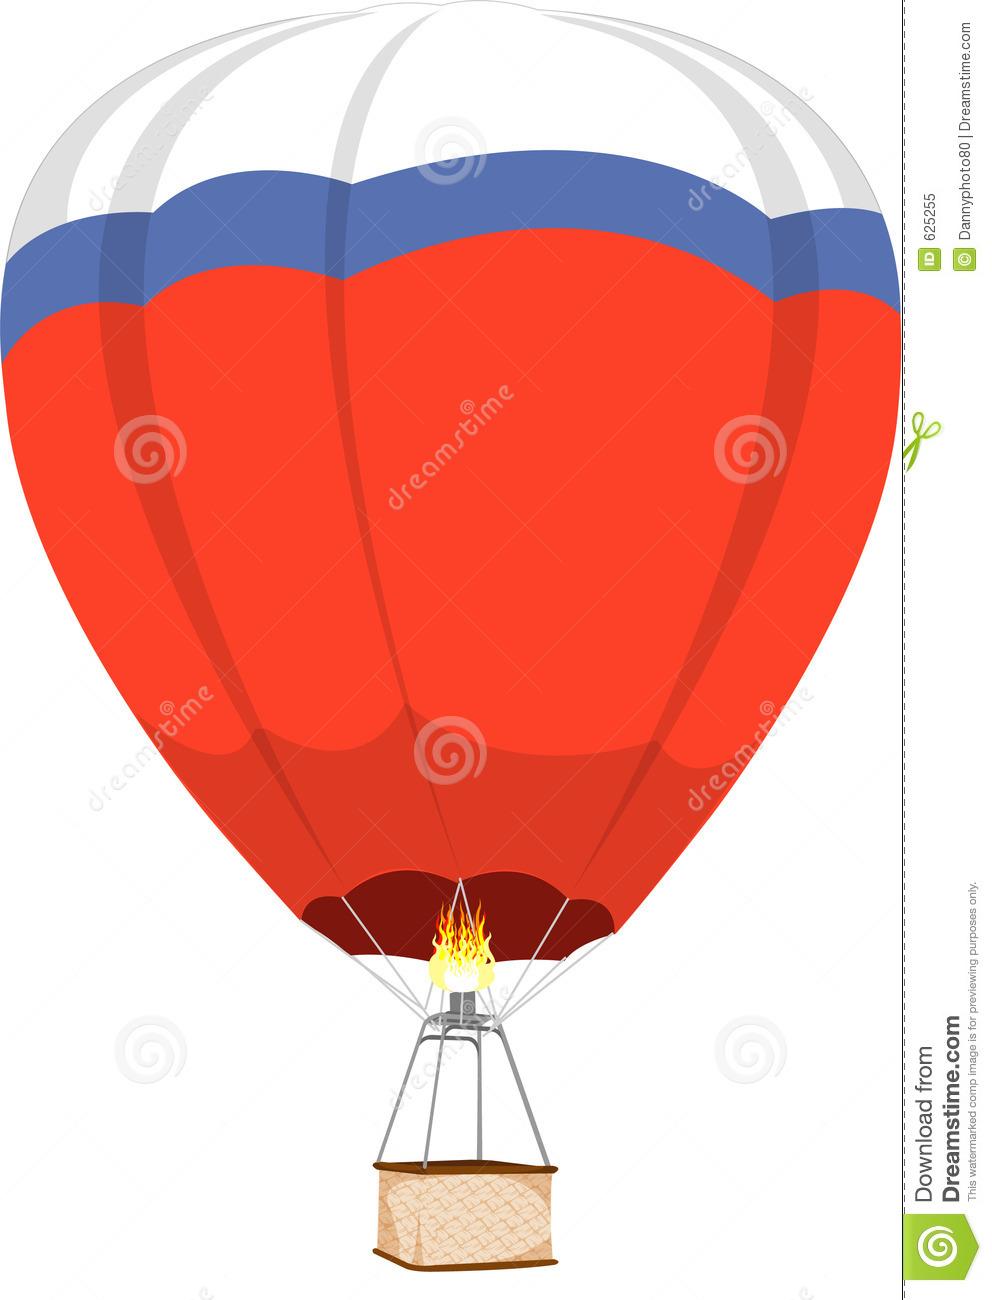 Orange clipart hot air balloon Outline Art hot%20air%20balloon%20basket%20clipart Images Clip